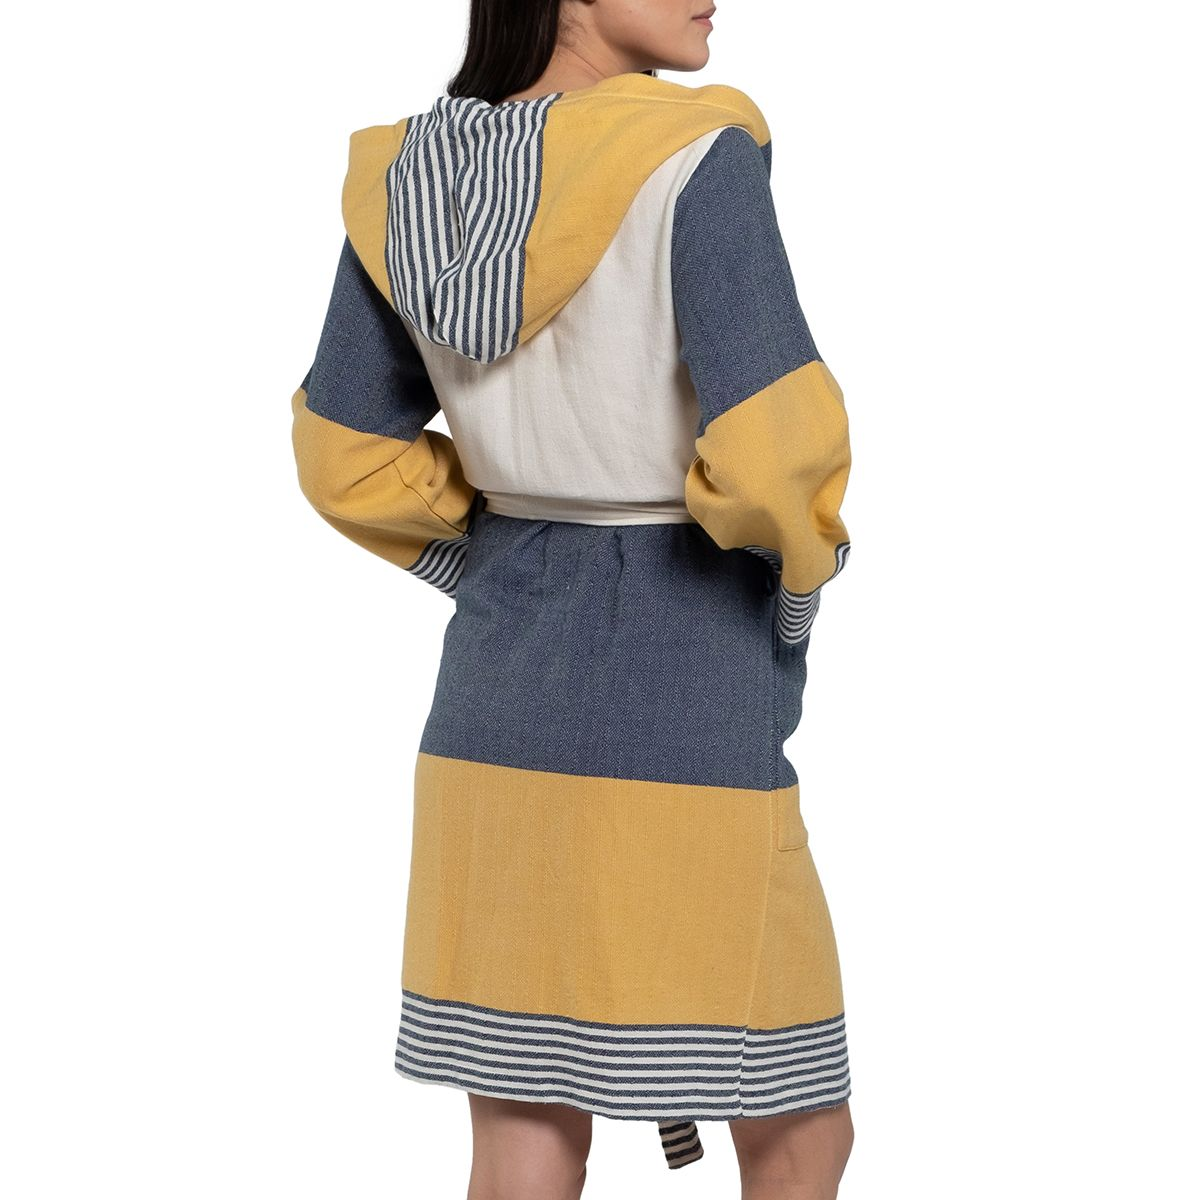 Bathrobe Twin Sultan with hood - Navy / Yellow